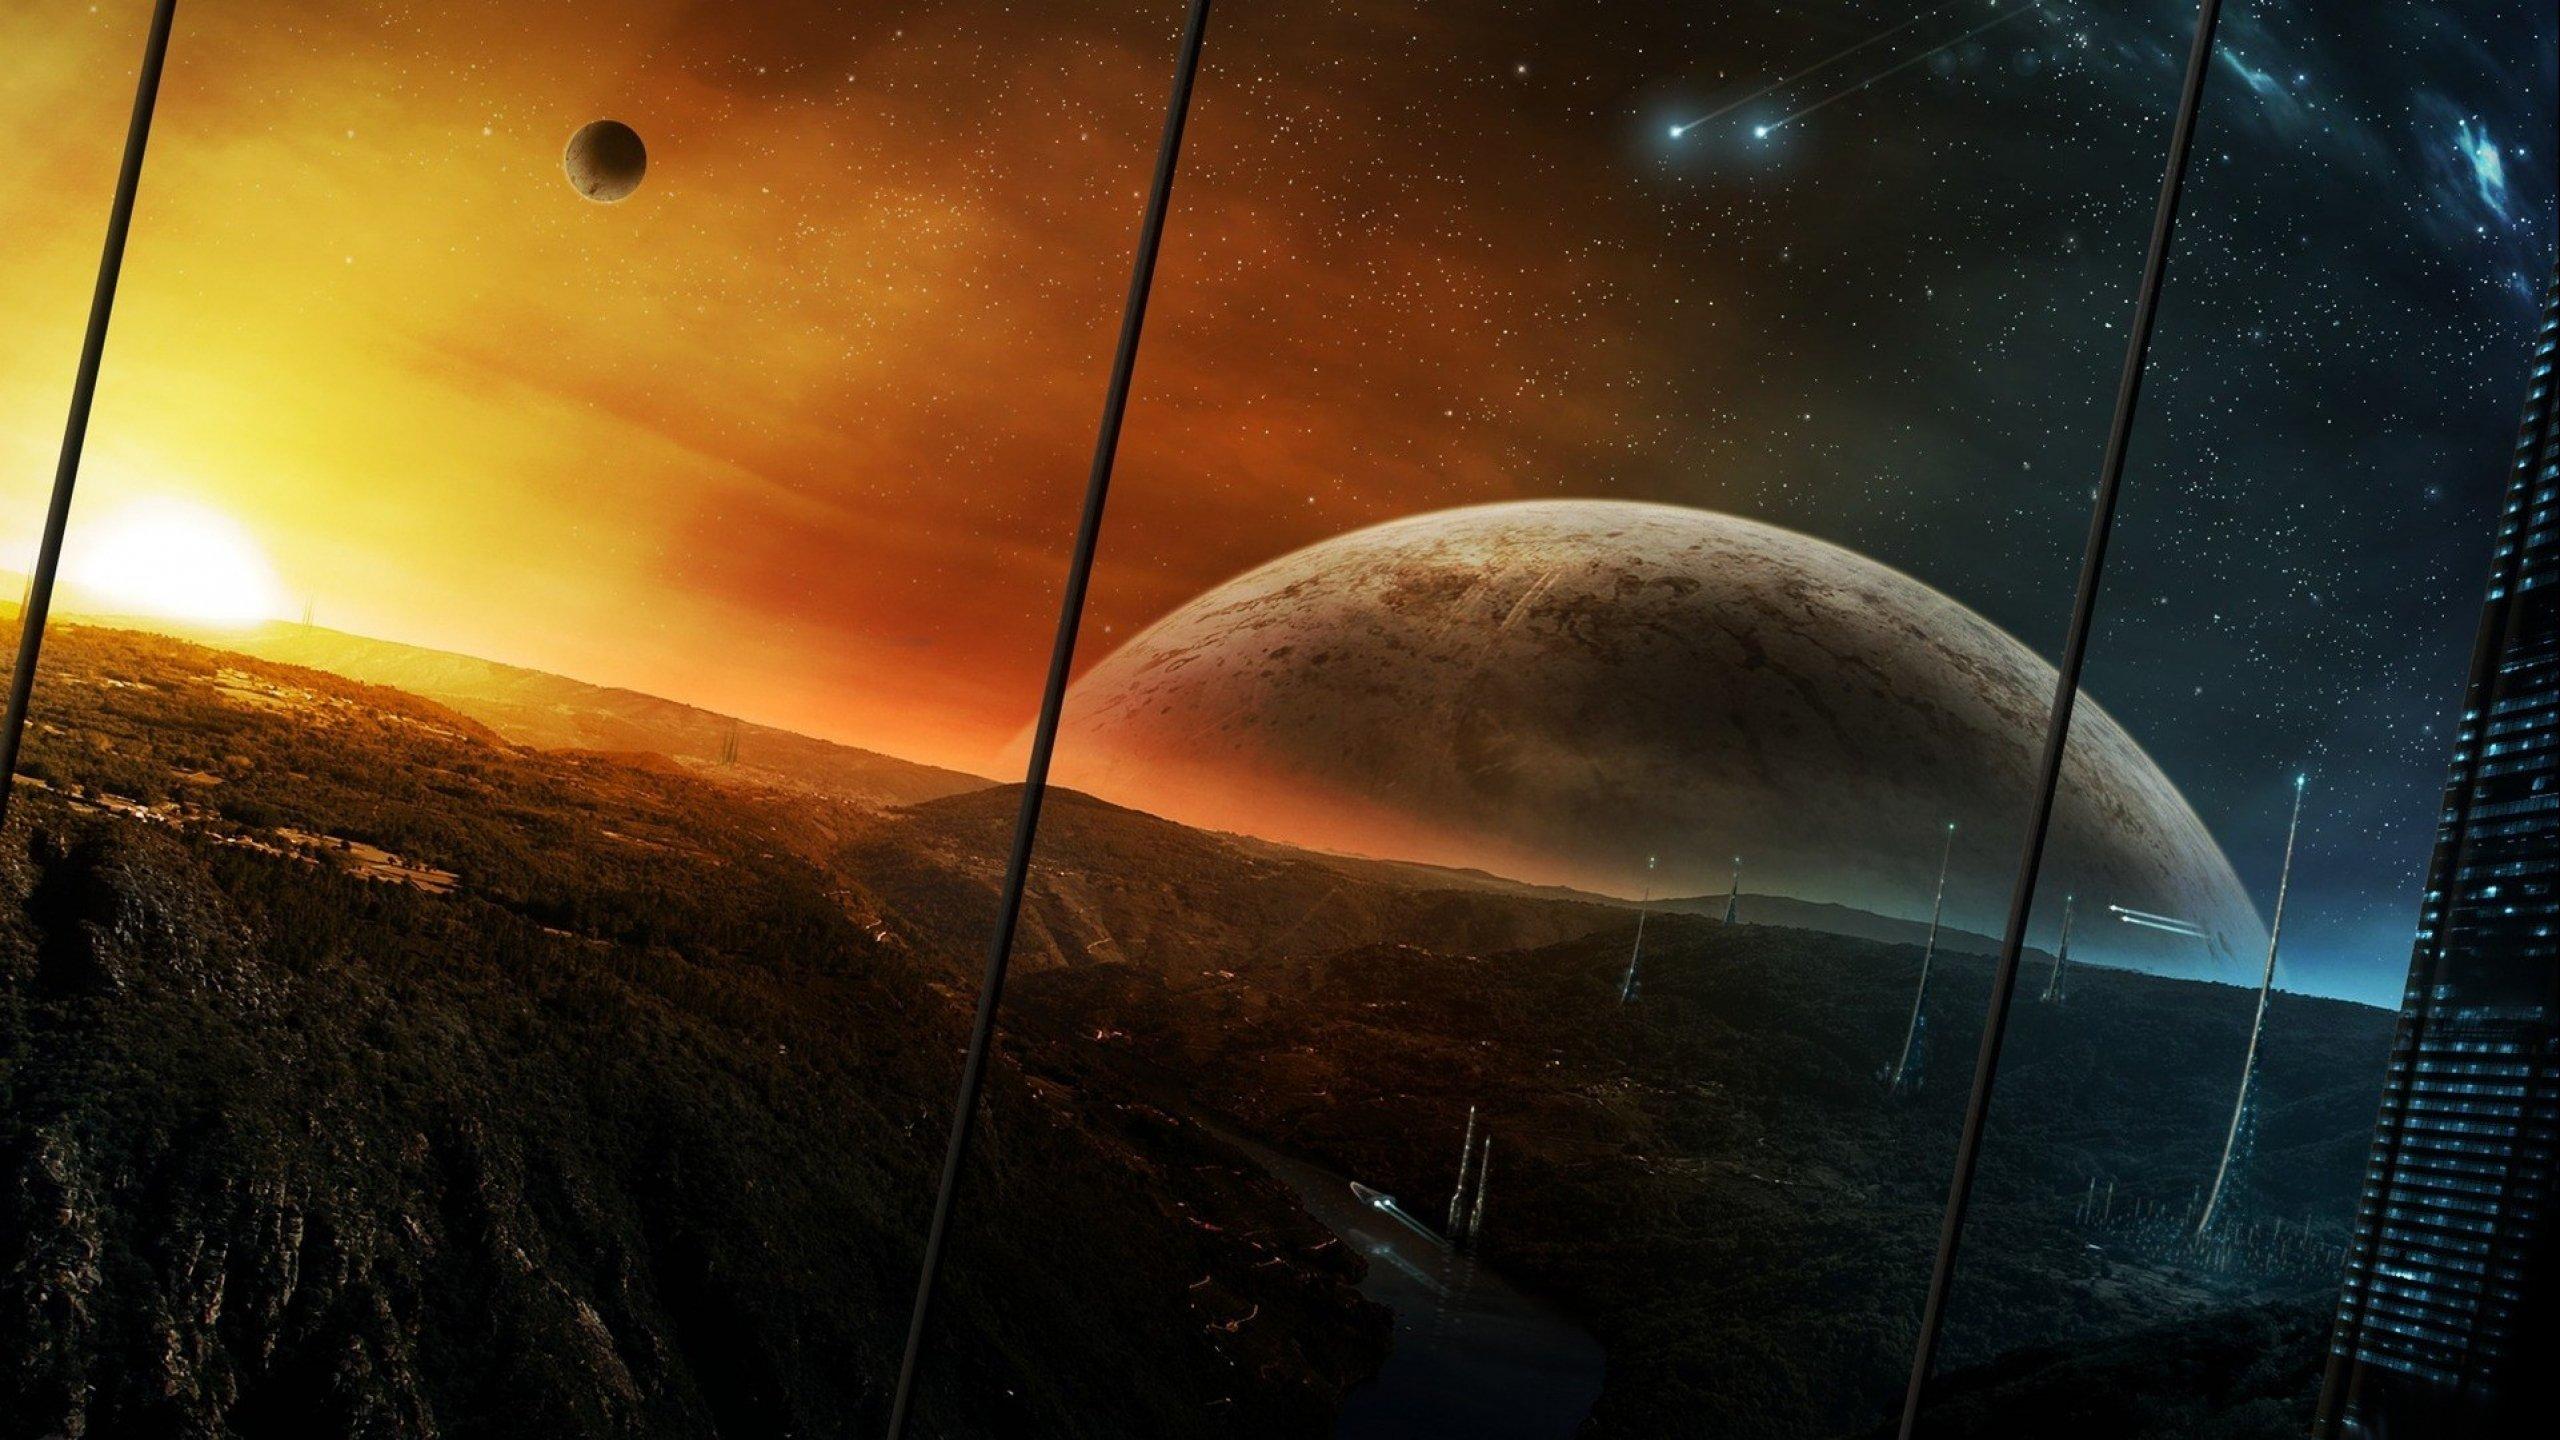 Sci Fi Wallpaper 2560x1440: Planetscape Sci-fi Planet Landscape Space Art Artwork